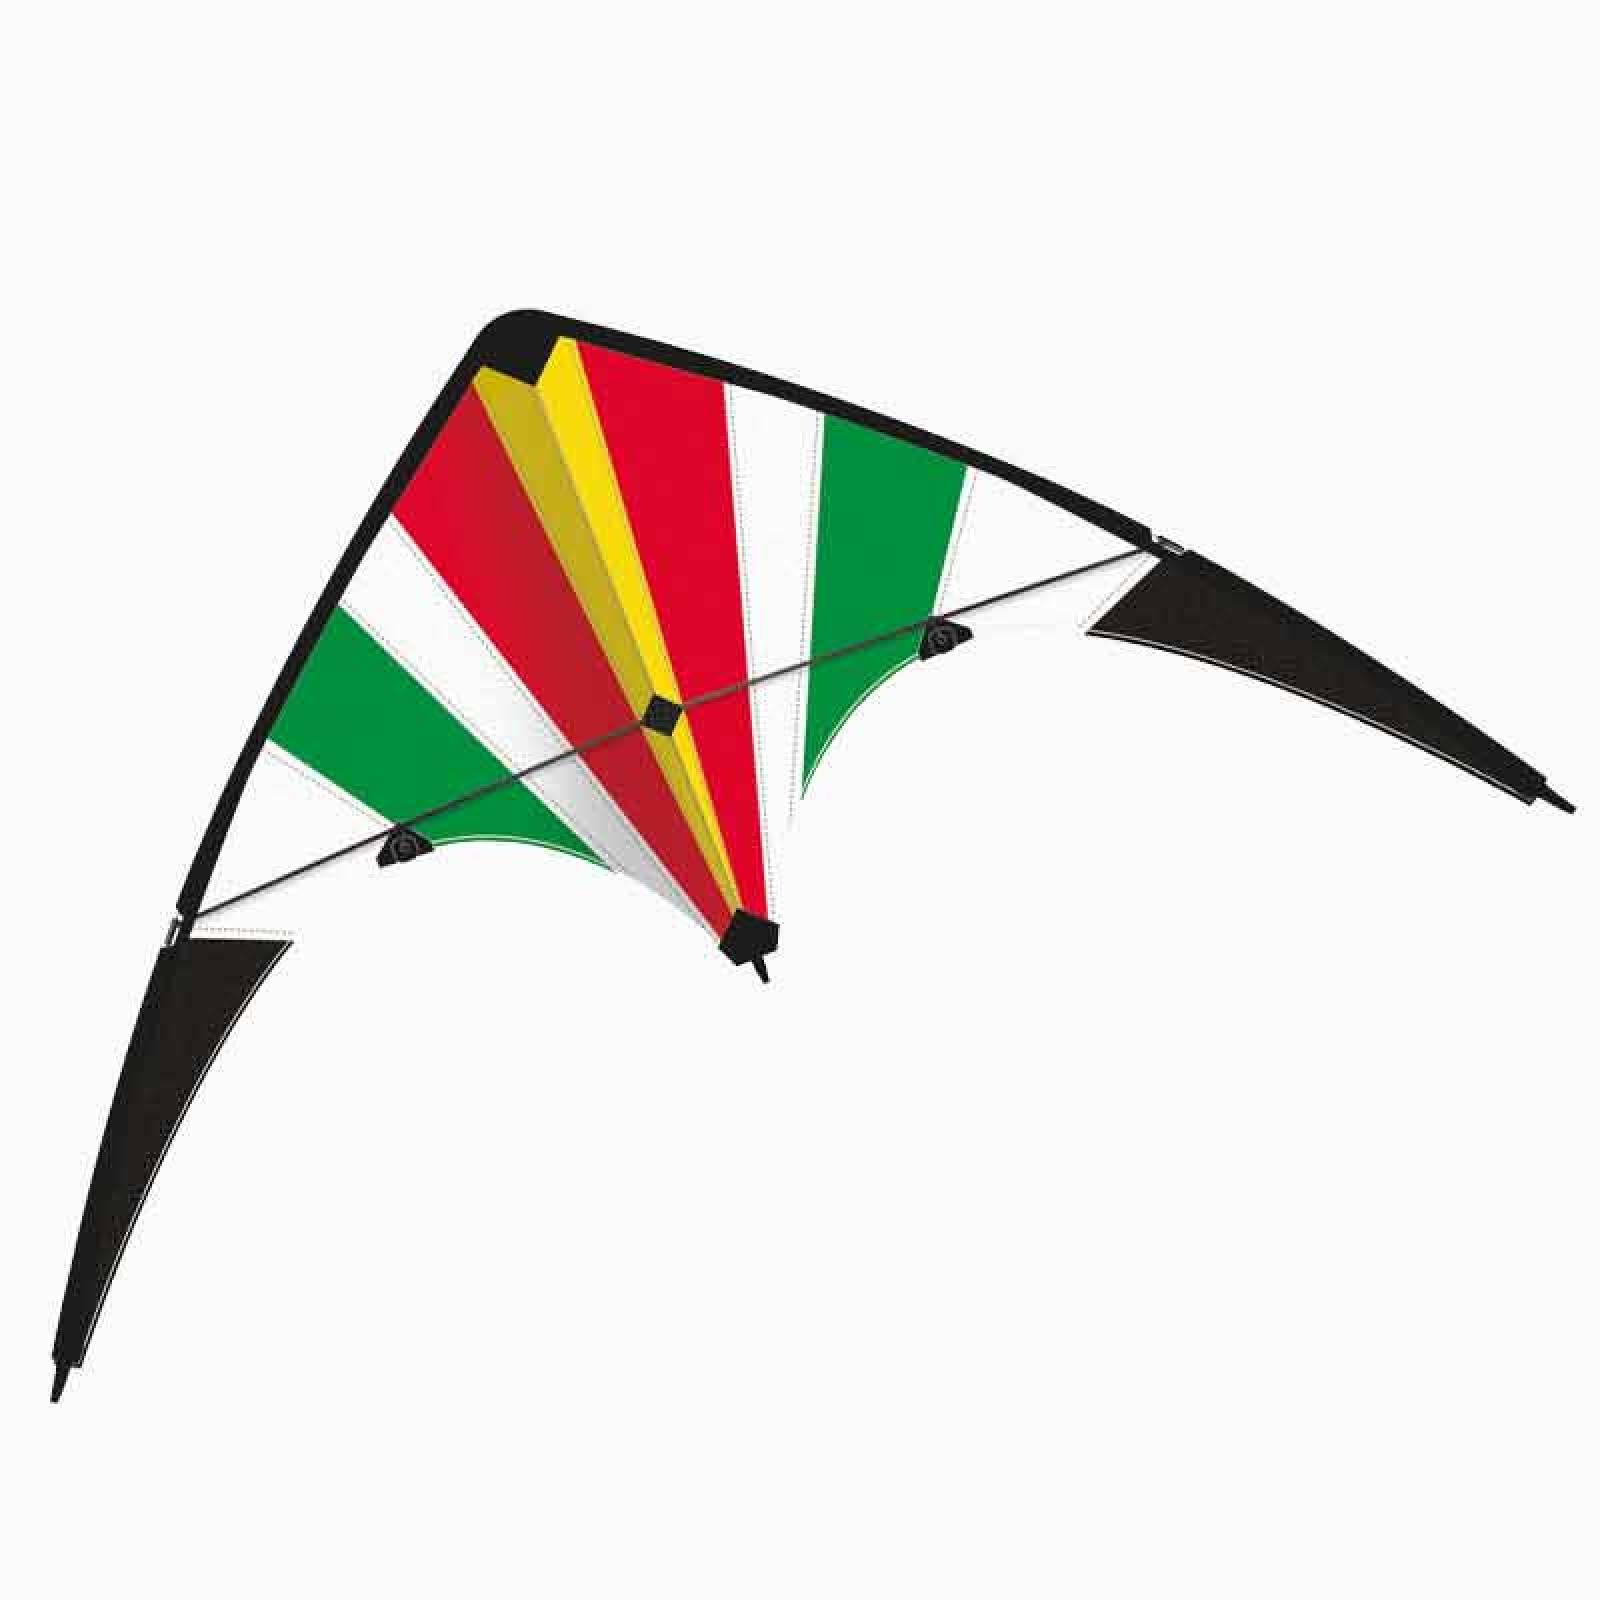 Gunther Lucky Loop Kite